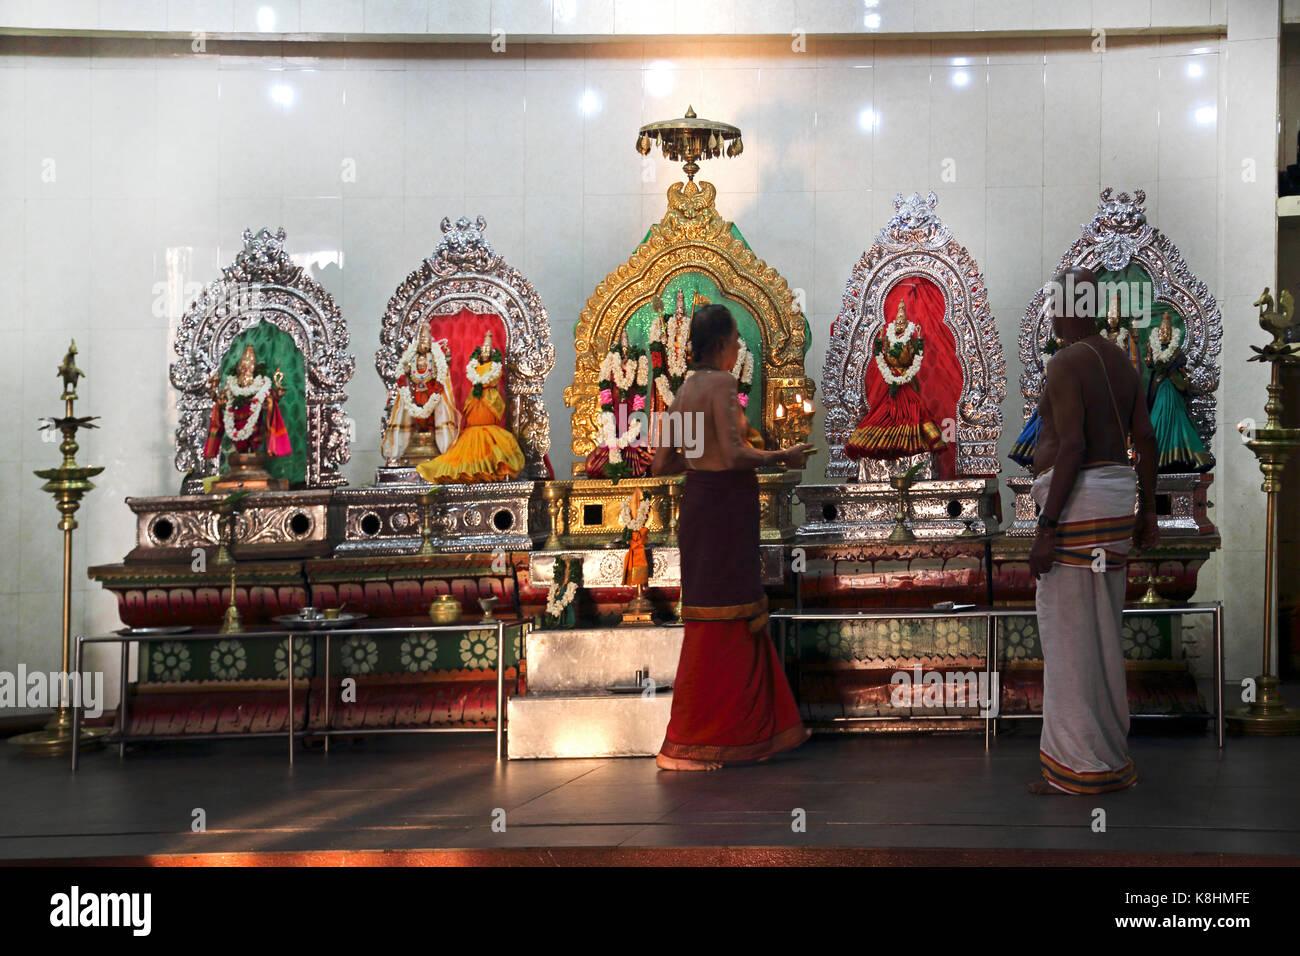 Pettah Colombo Sri Lanka New Kathiresan Kovil Temple Dedicated To War God Murugan Men With Candles By Statues Of - Stock Image